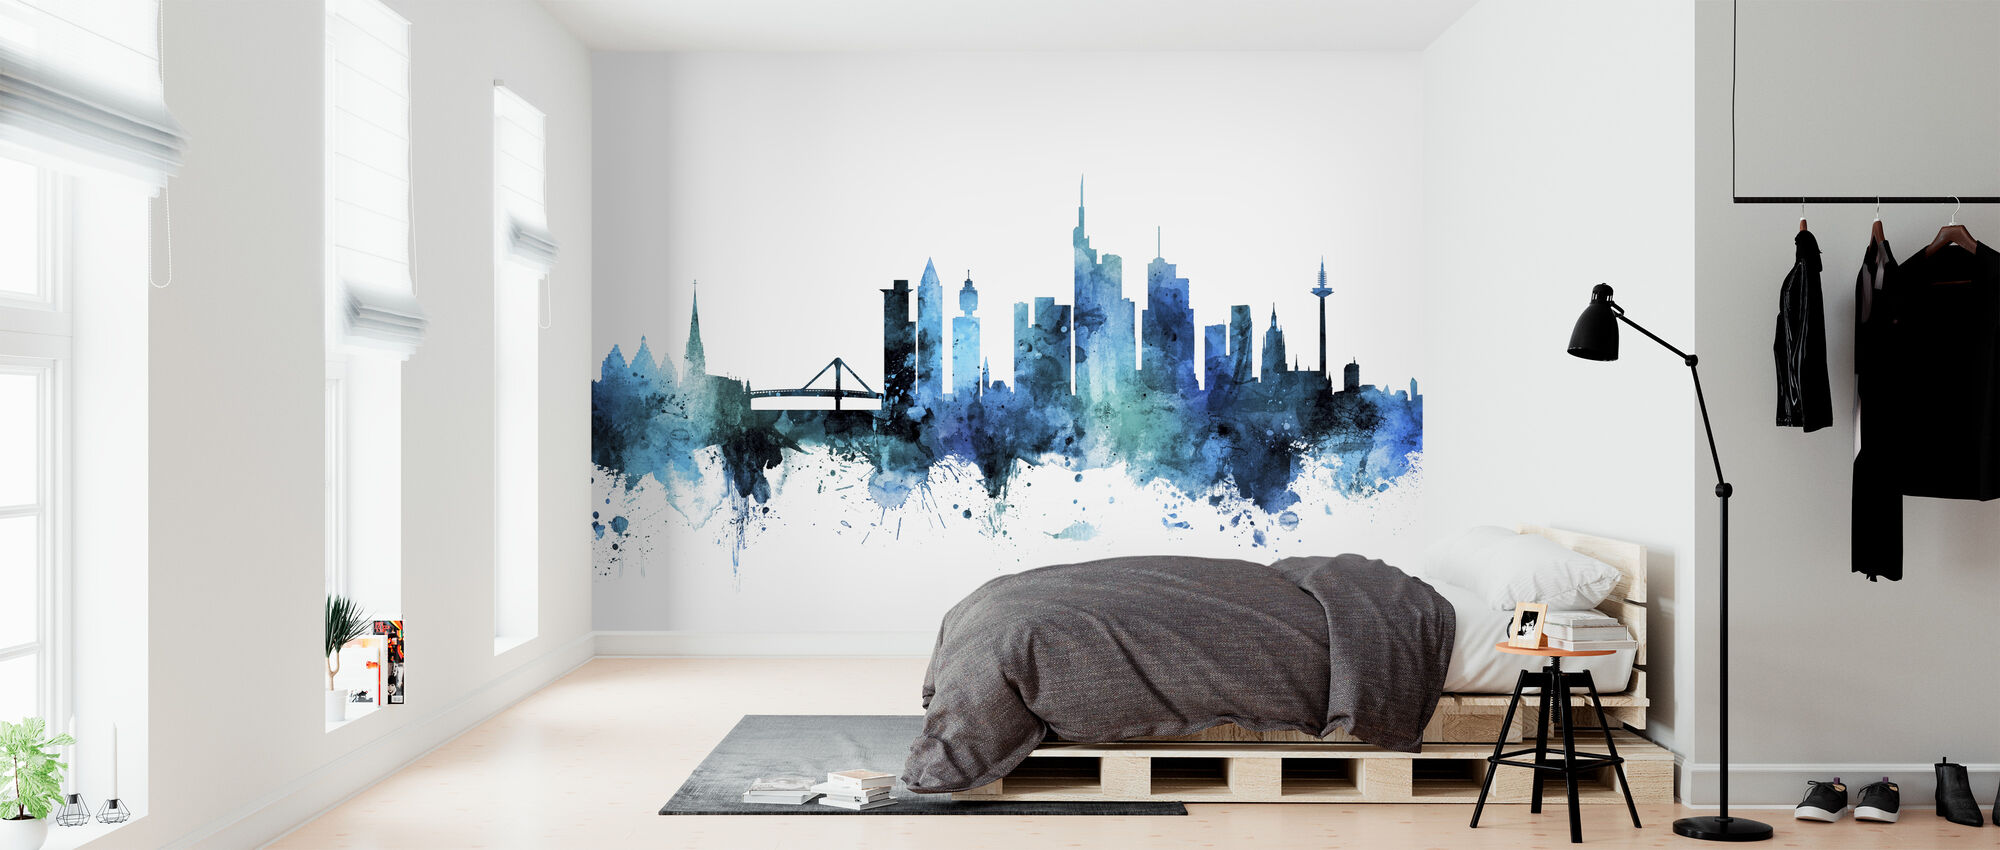 Frankfurt Germany Skyline - Wallpaper - Bedroom